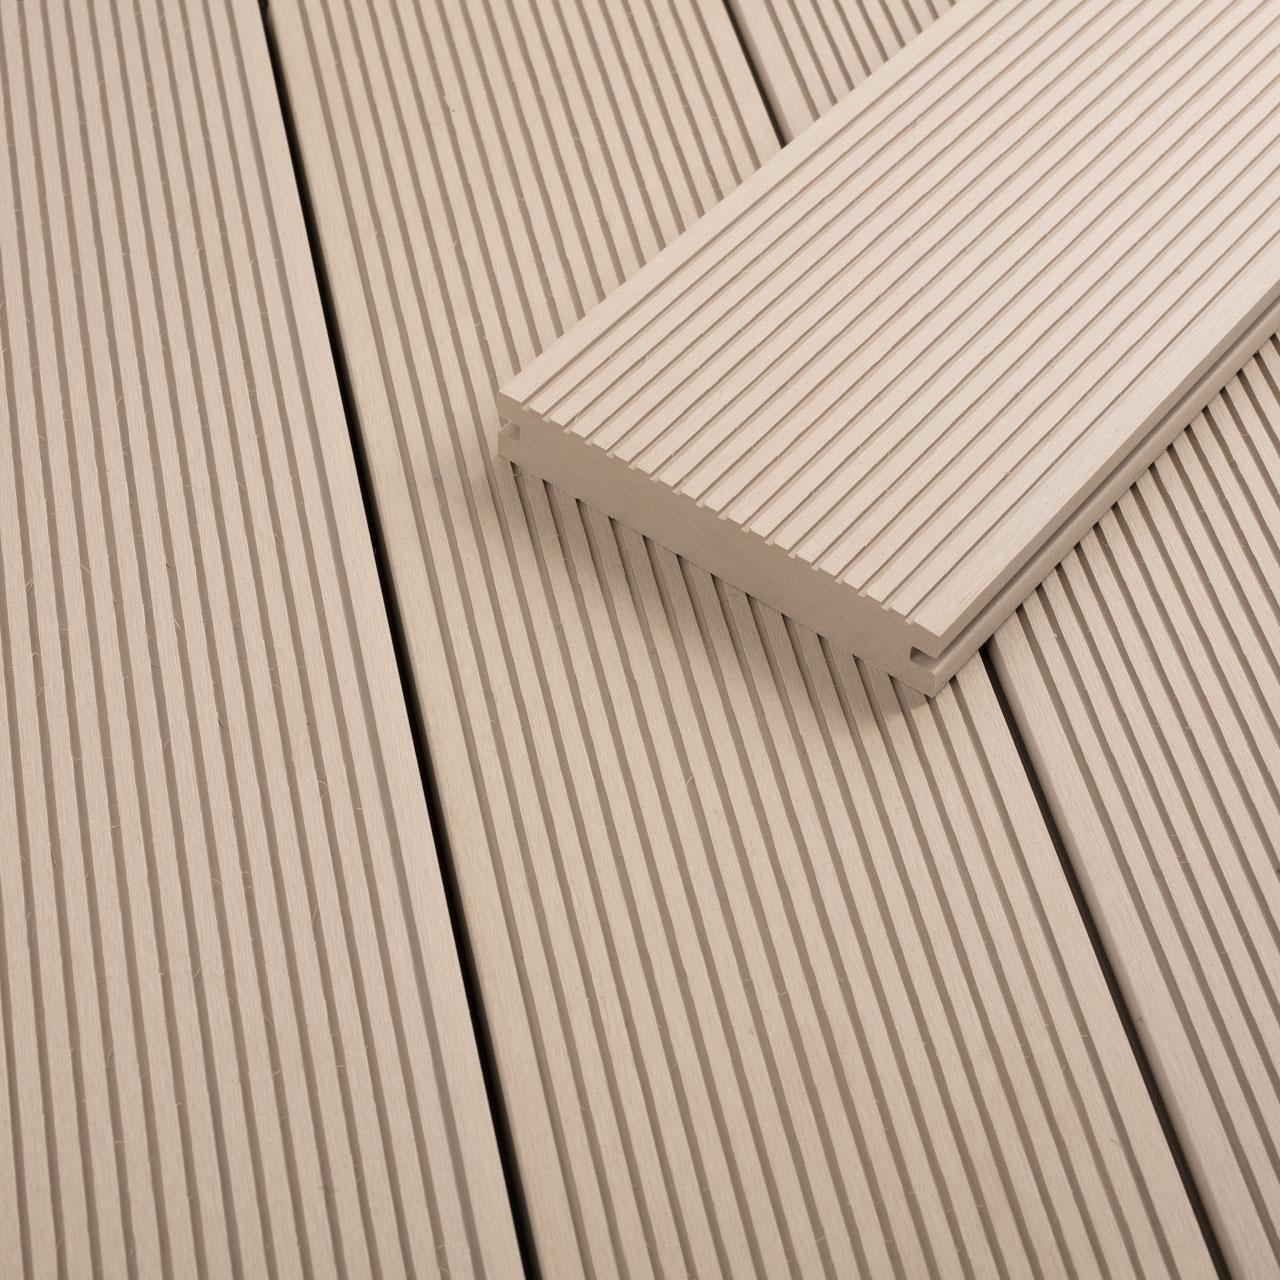 FANO WPC Terrassendiele massiv Elfenbein, glatt / fein gerillt